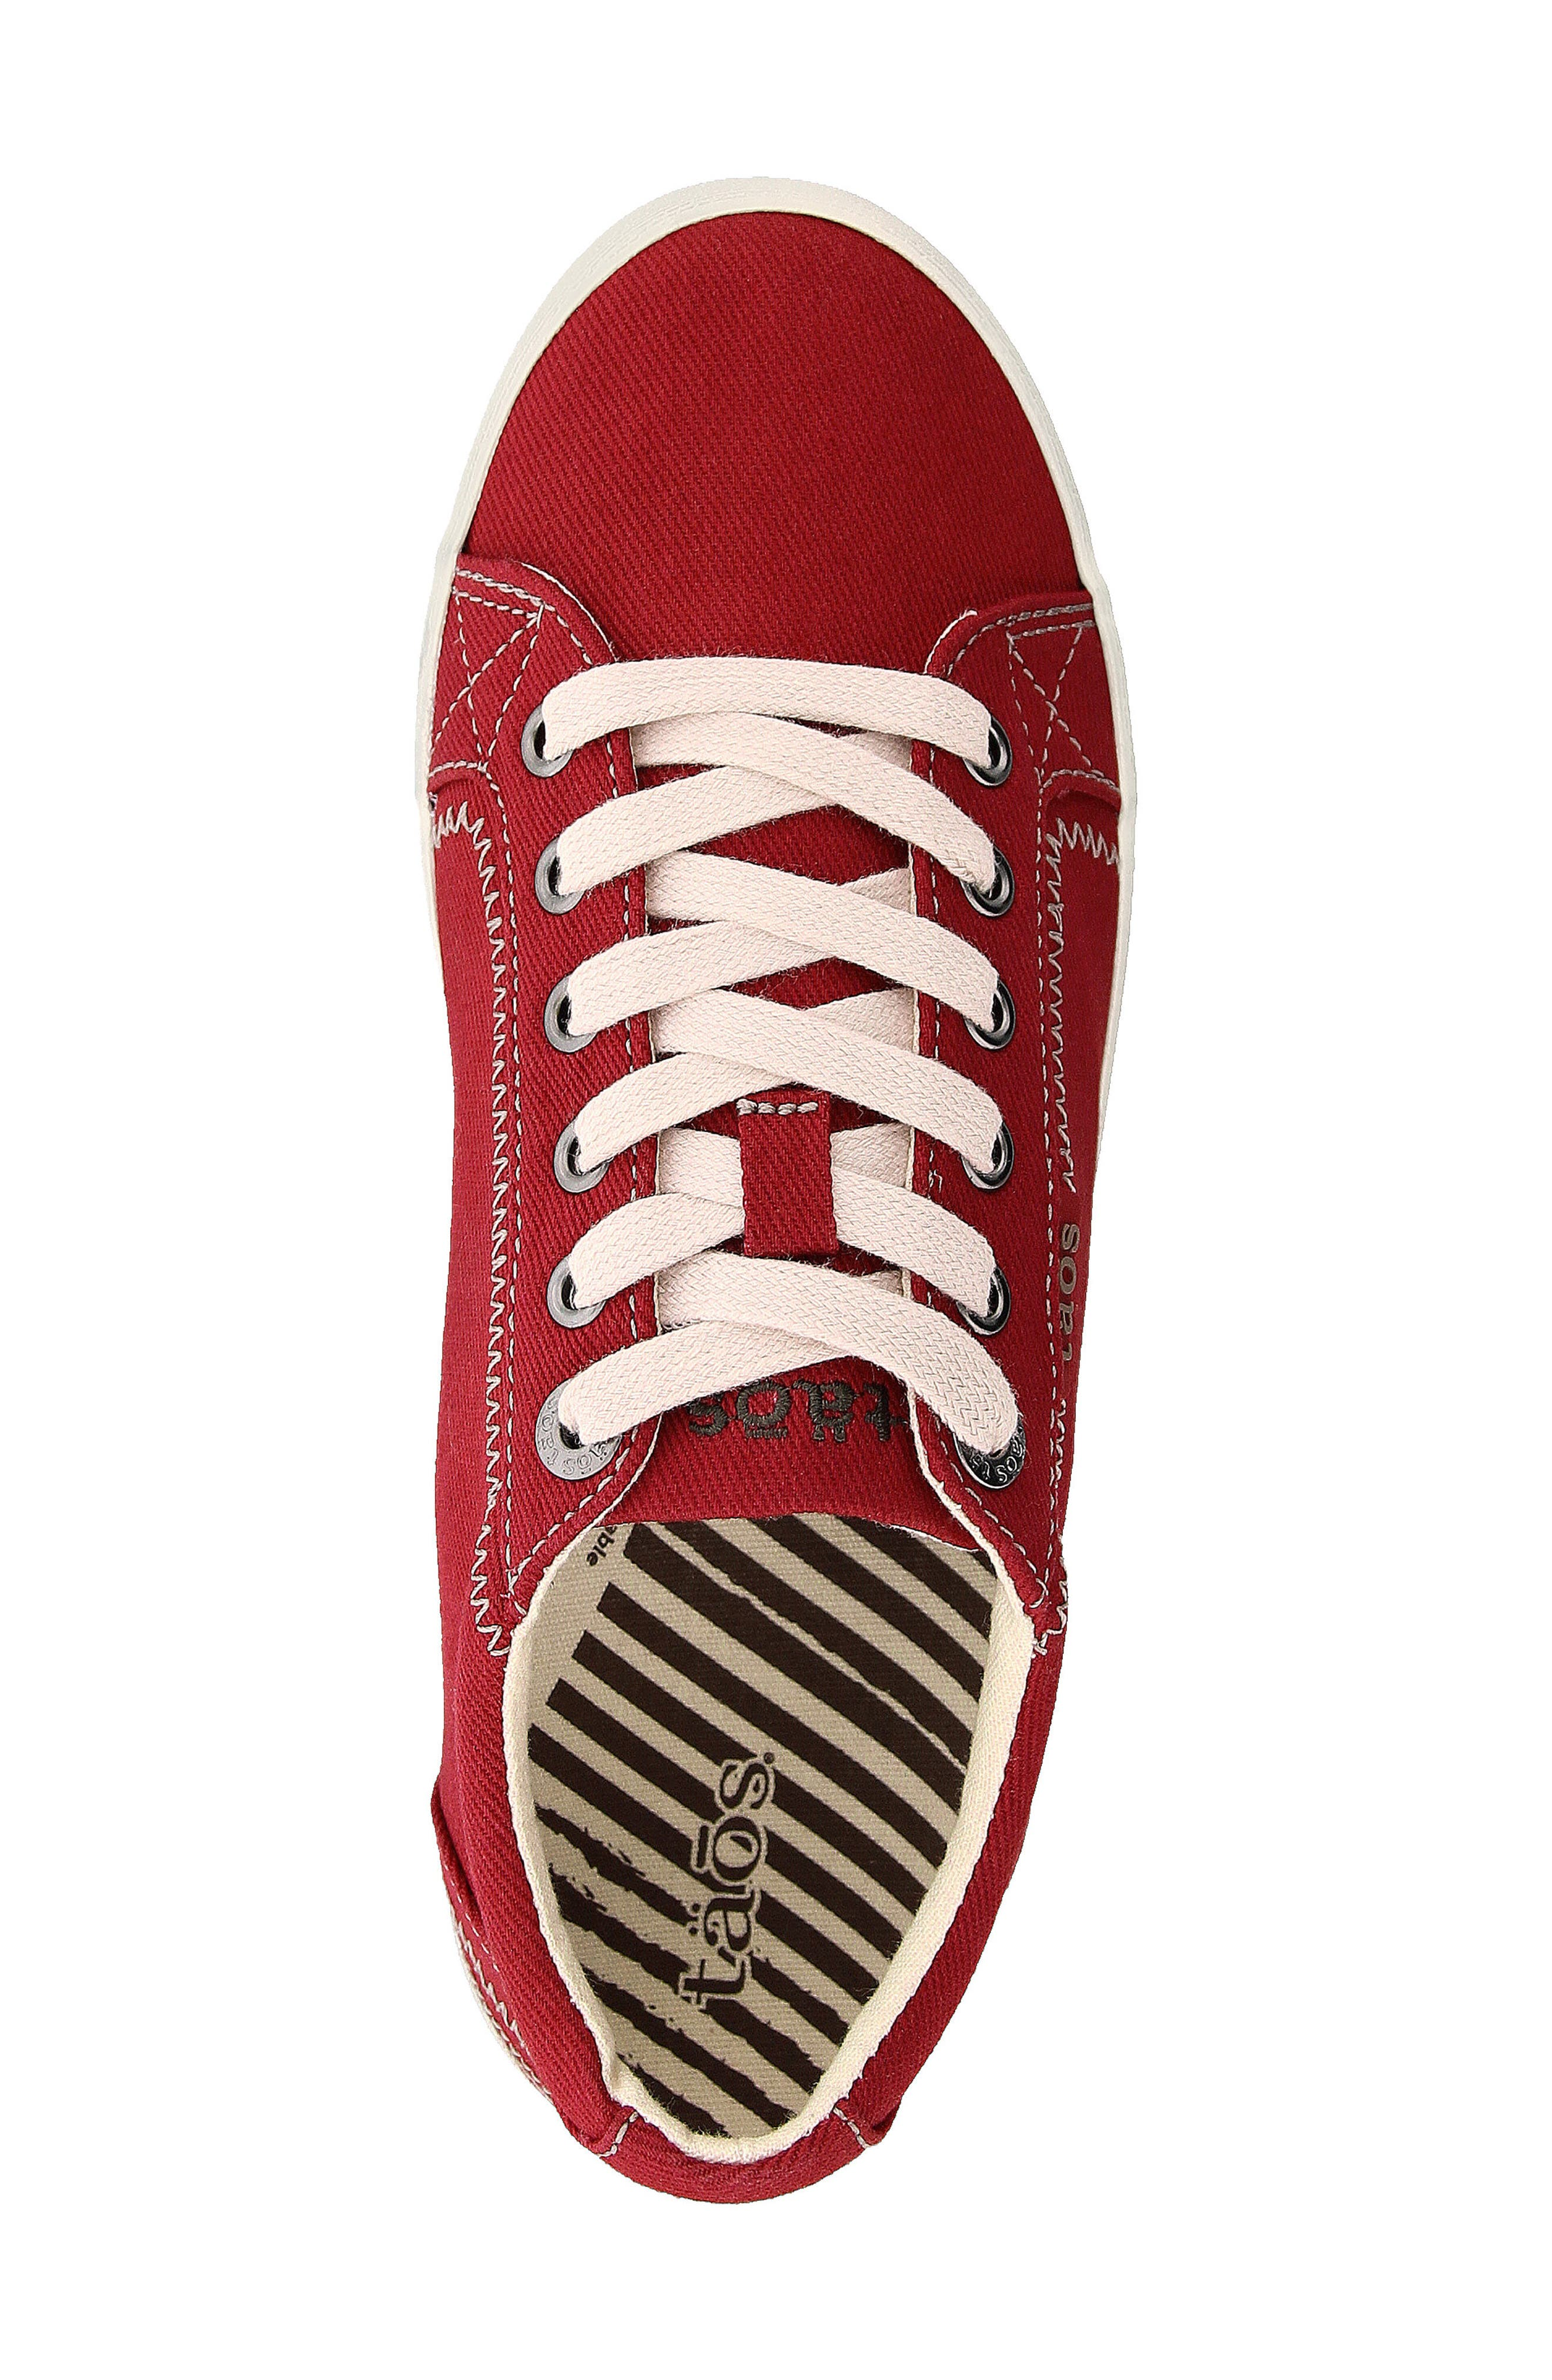 Alternate Image 3  - Taos 'Star' Sneaker (Women)